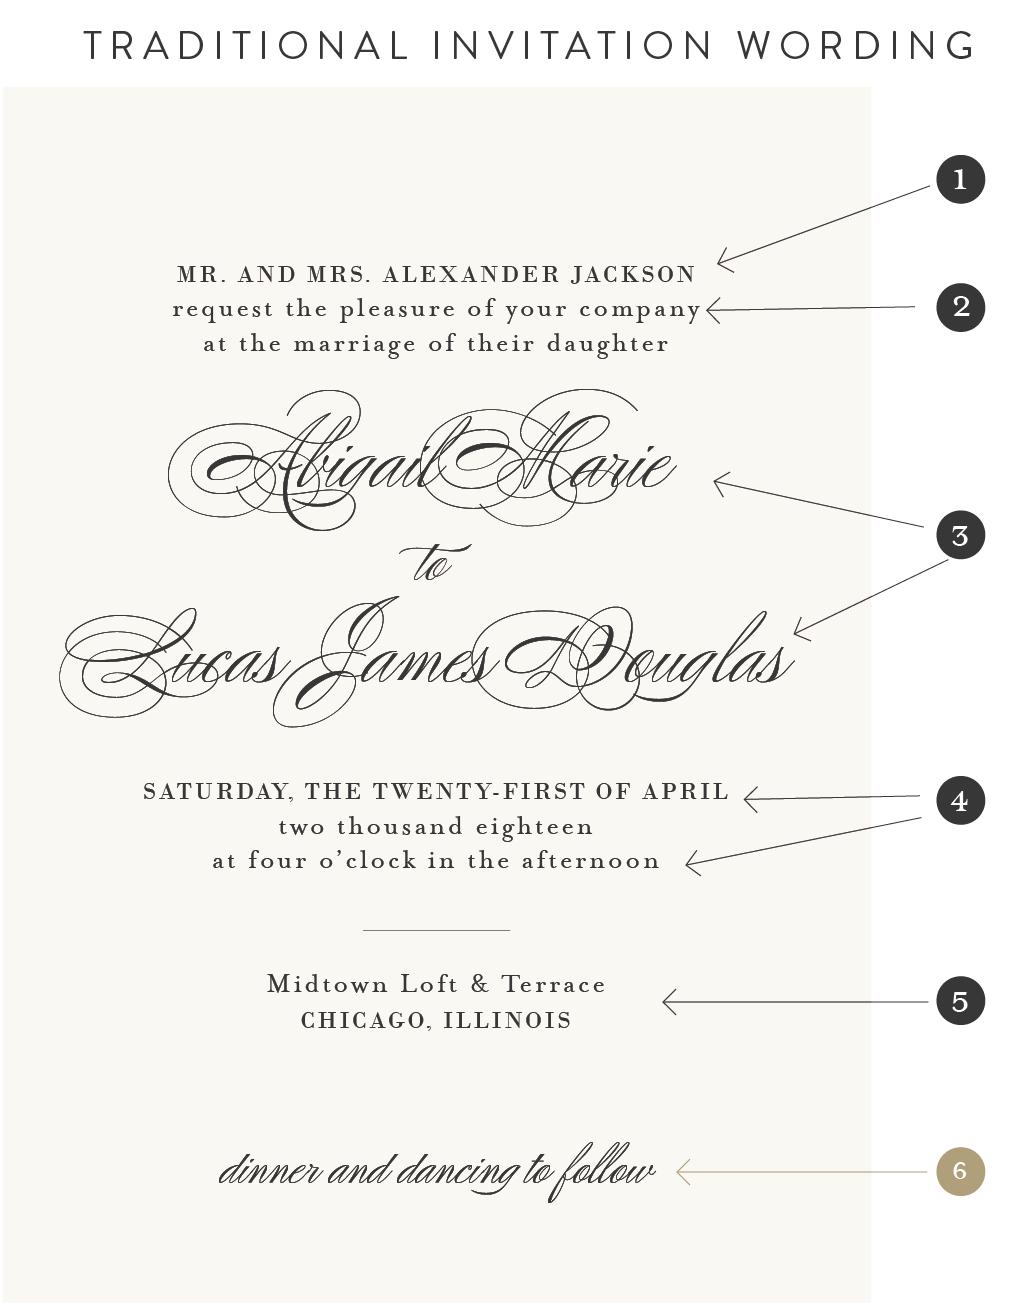 traditional invitation wording